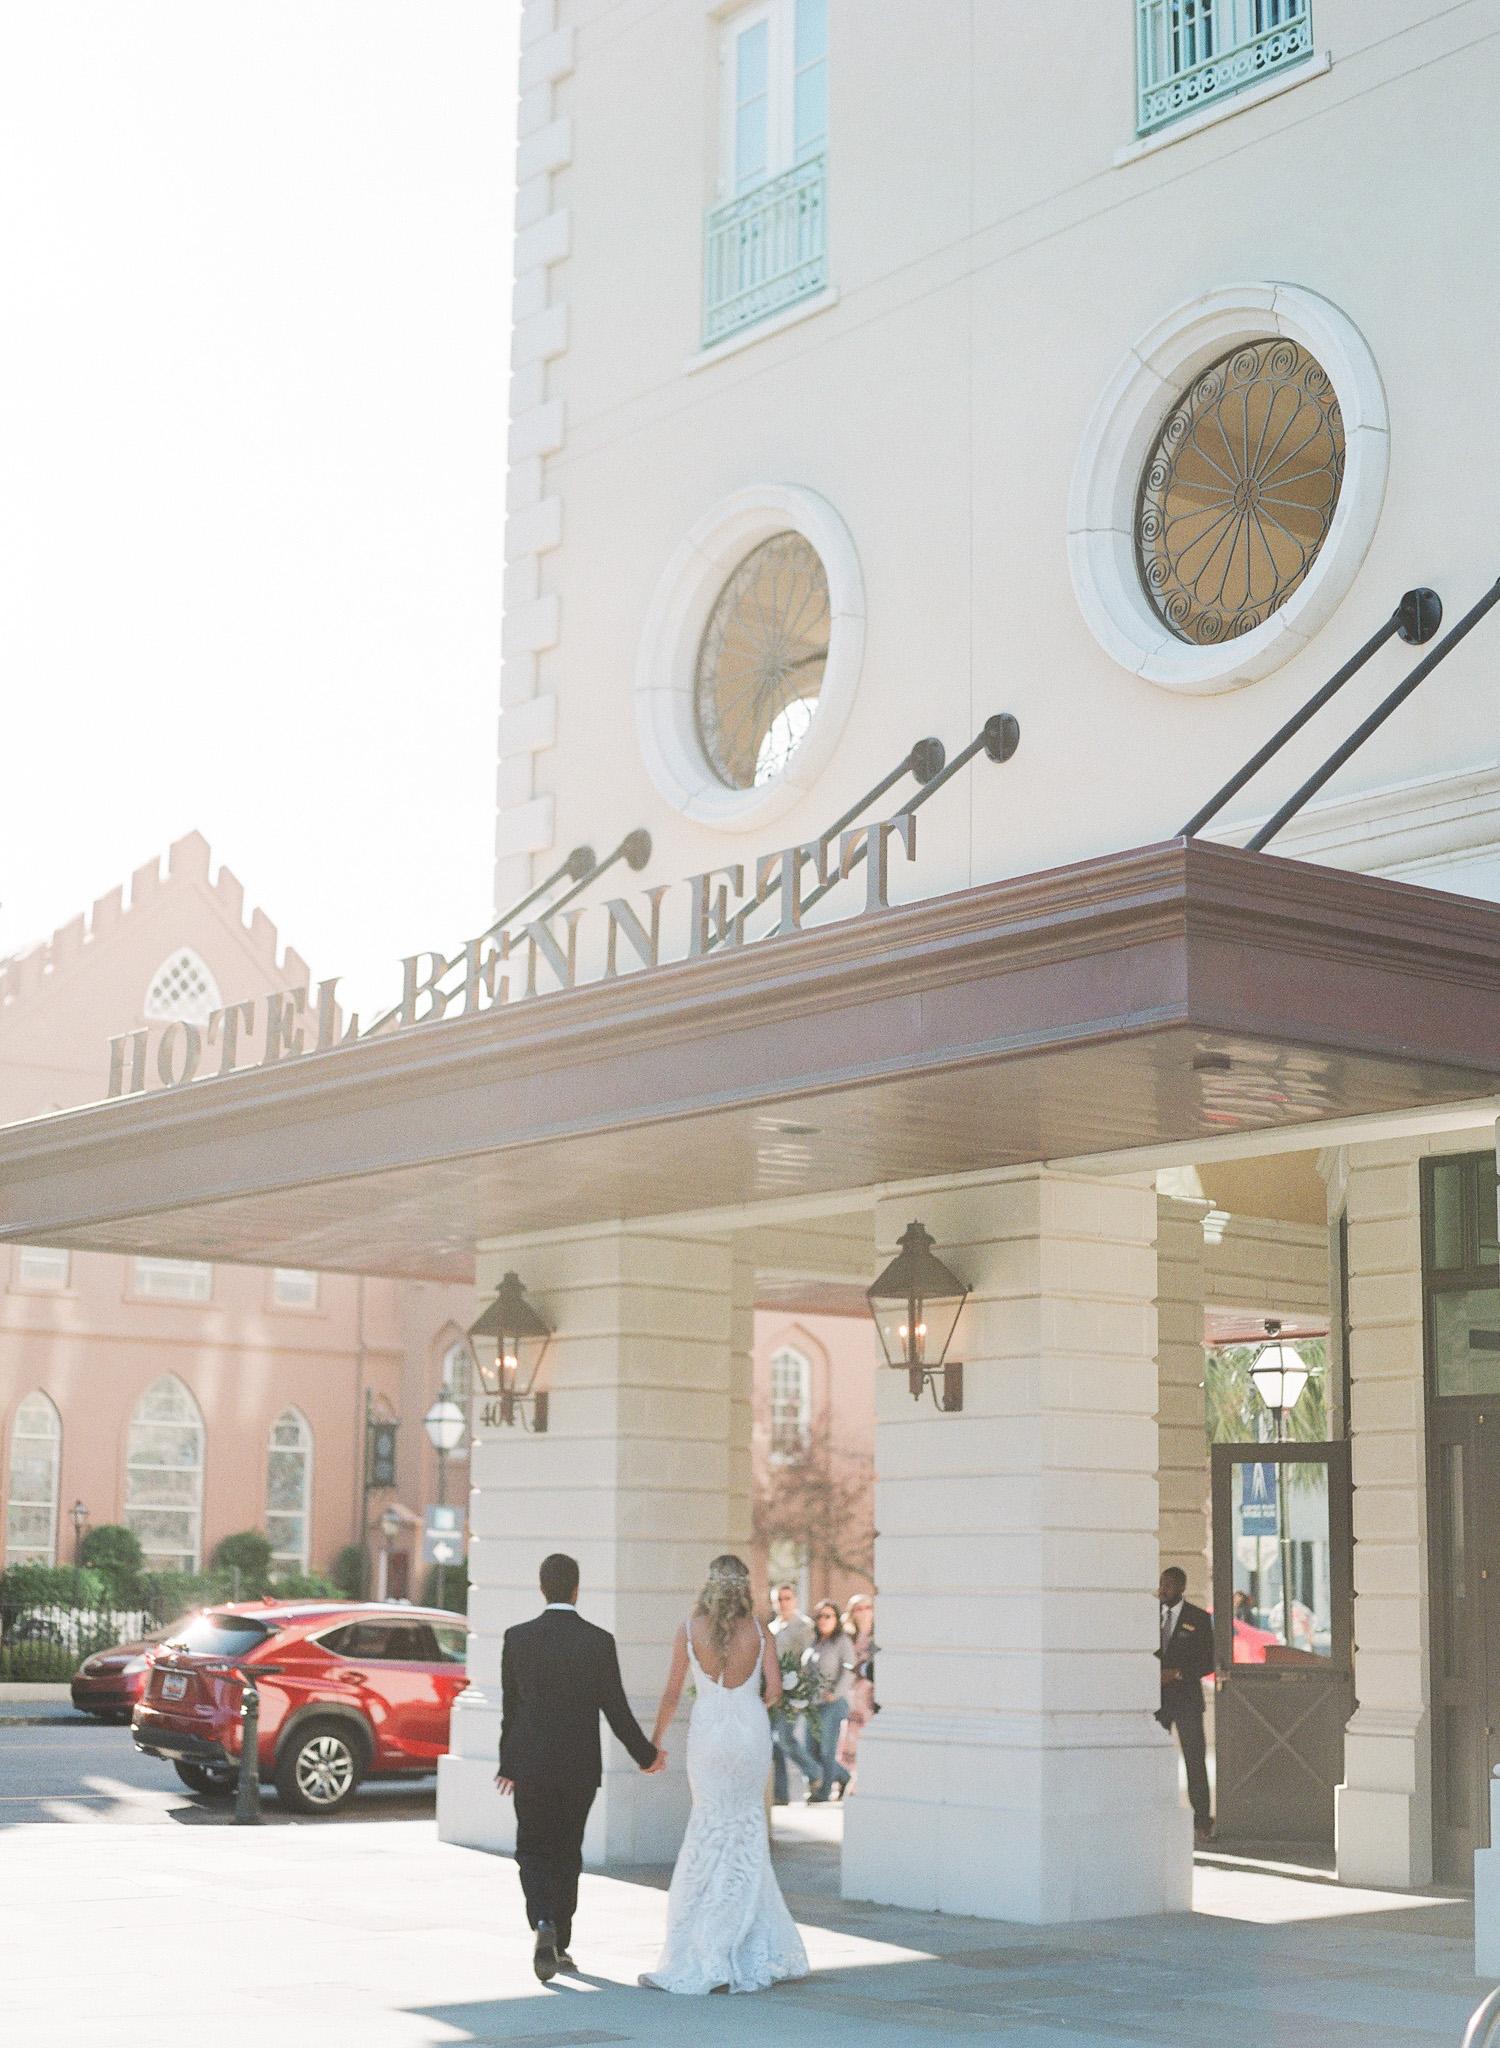 Charleston-Wedding-Photographers-Hotel-Bennett-87.jpg